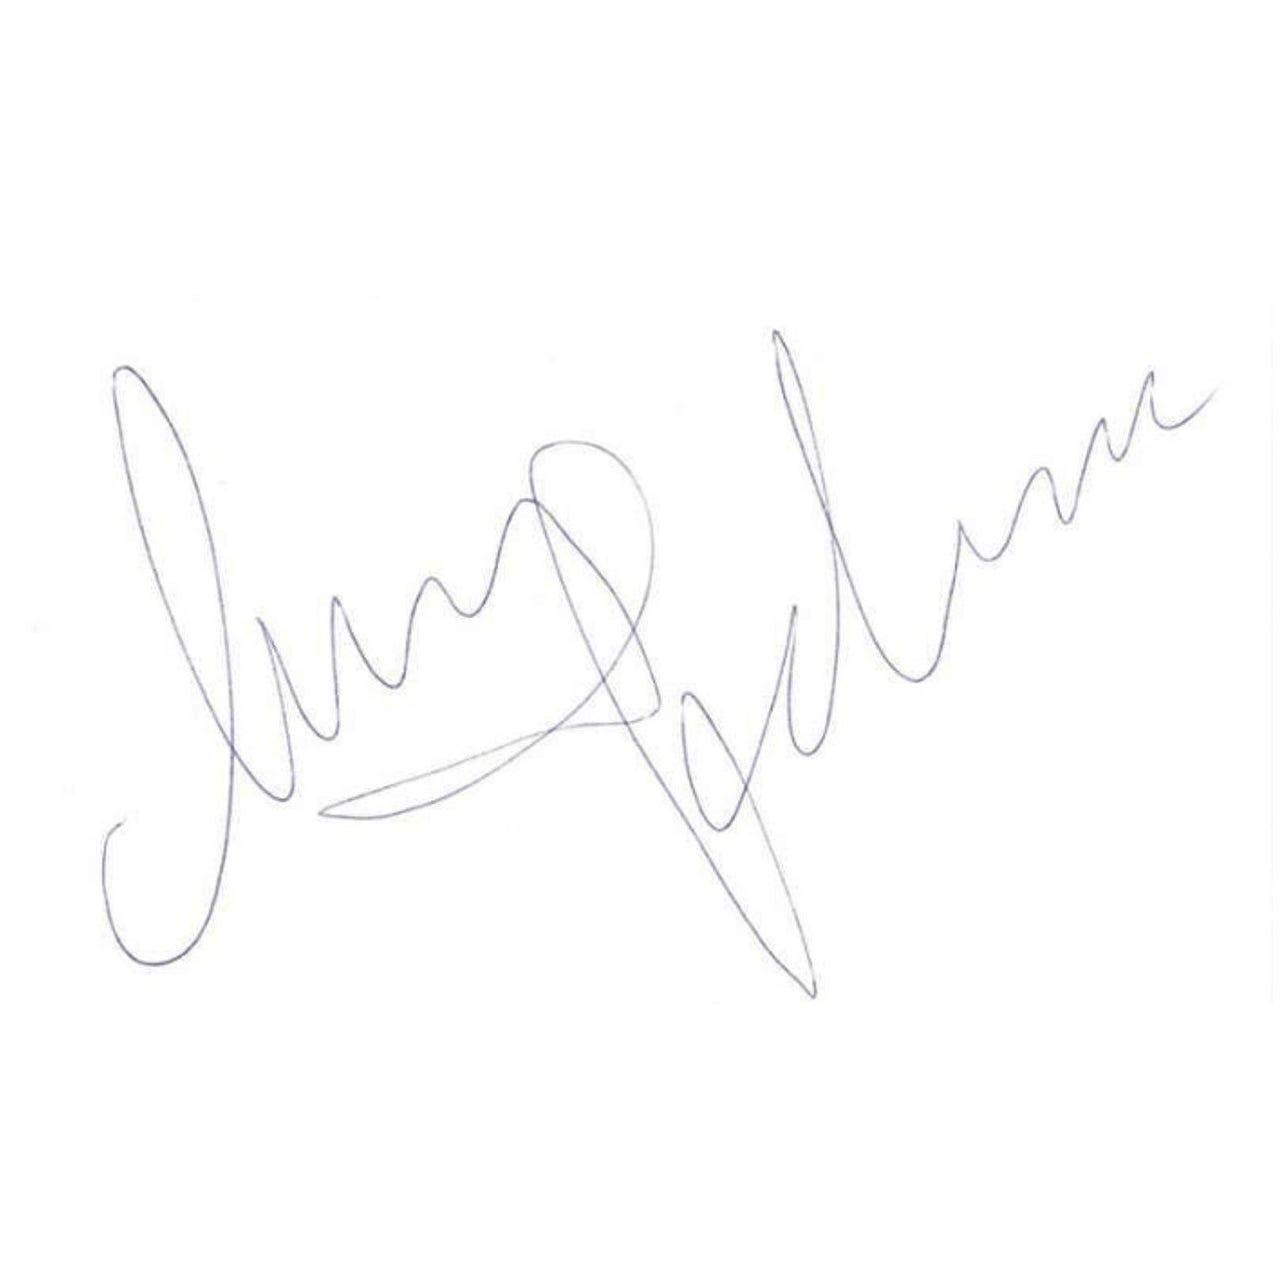 Madonna Original Autograph in Blue Ink on Paper